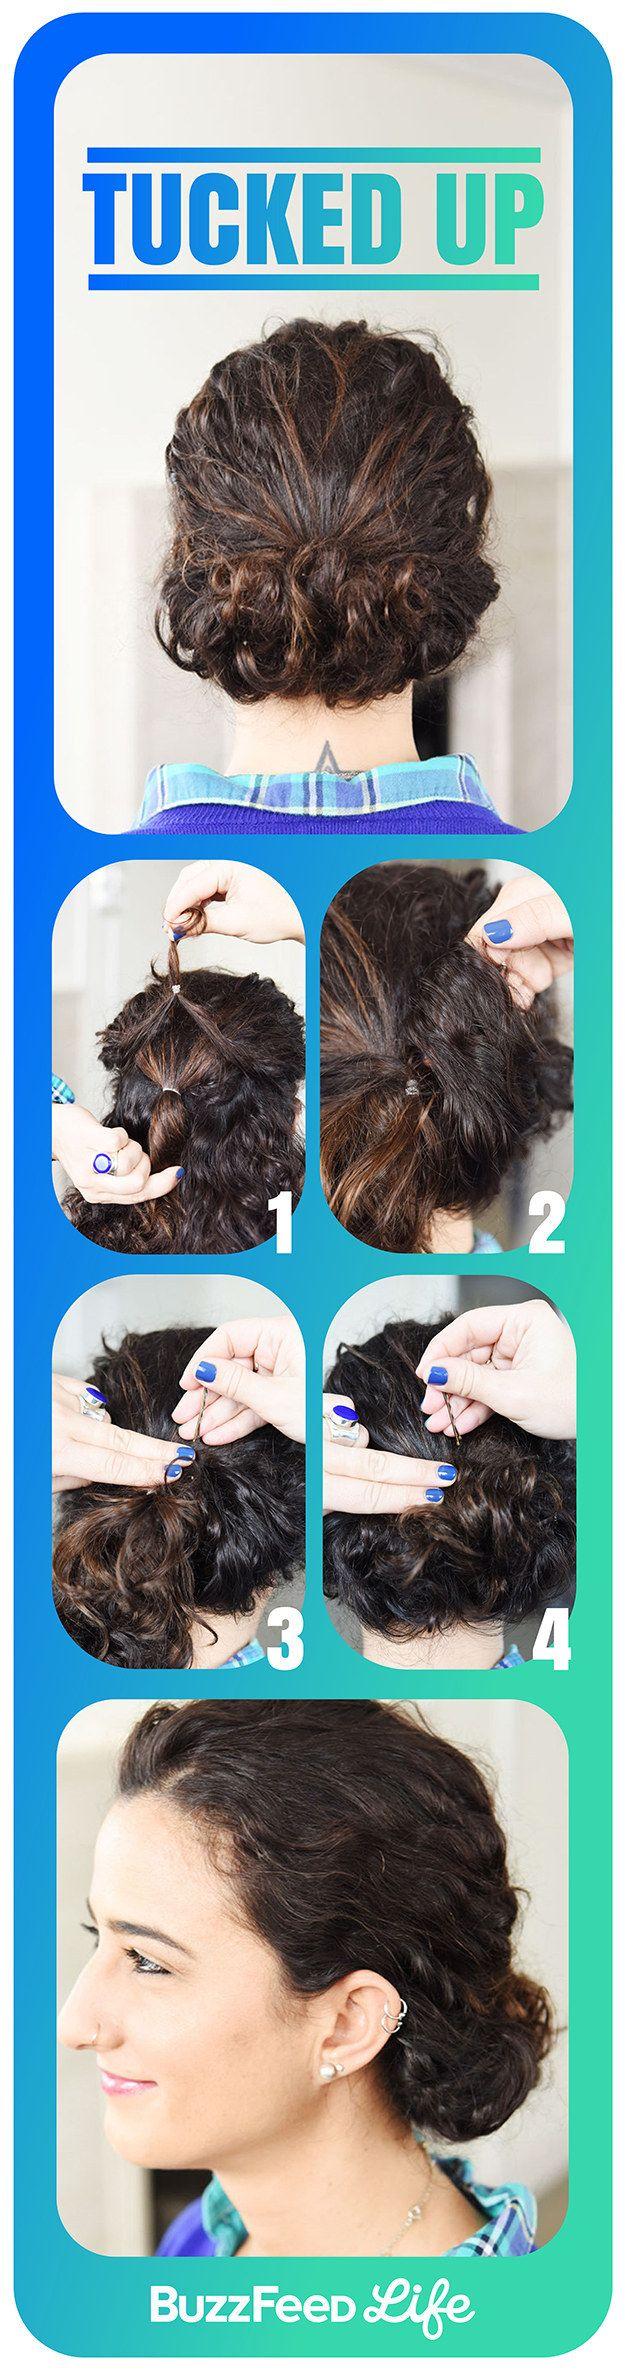 Todo enrollado | 26 increíbles peinados que podrás aprender en 10 pasos o menos